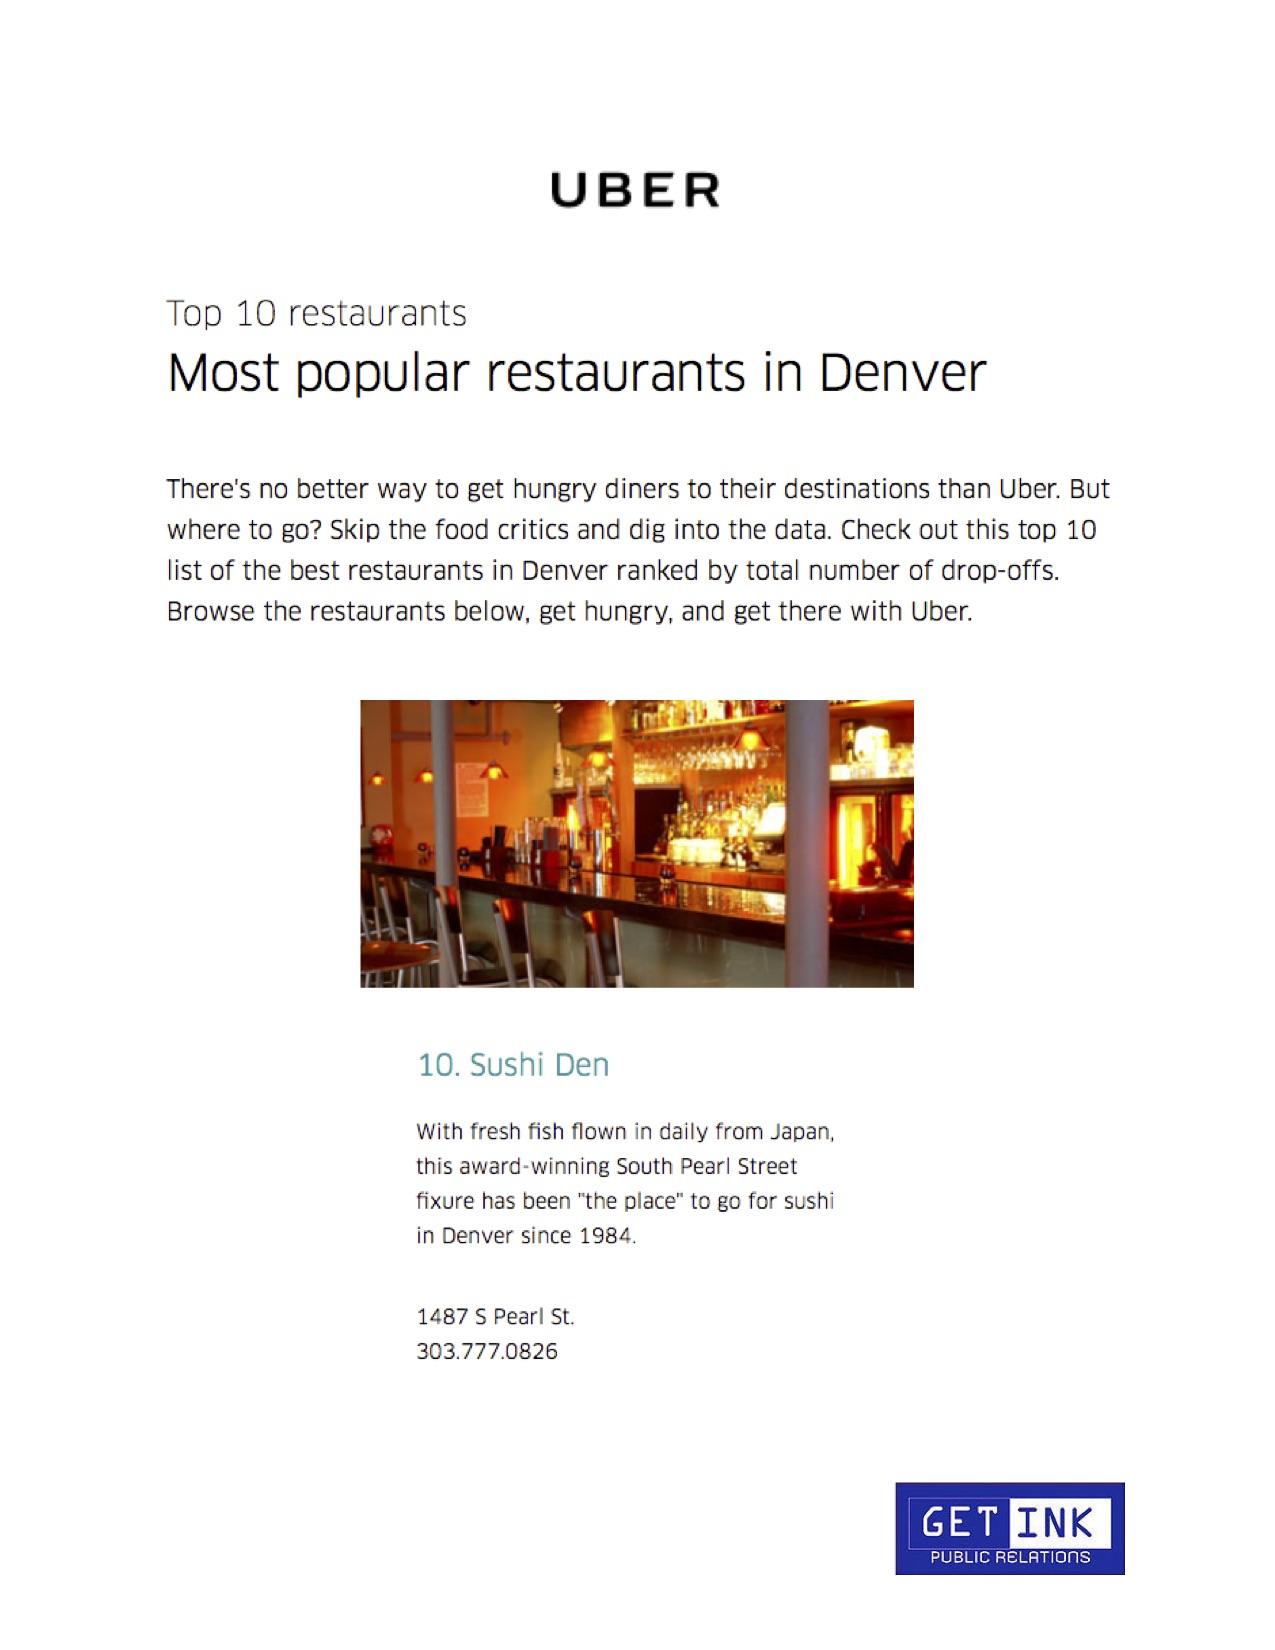 SushiDen.Uber.March.18.